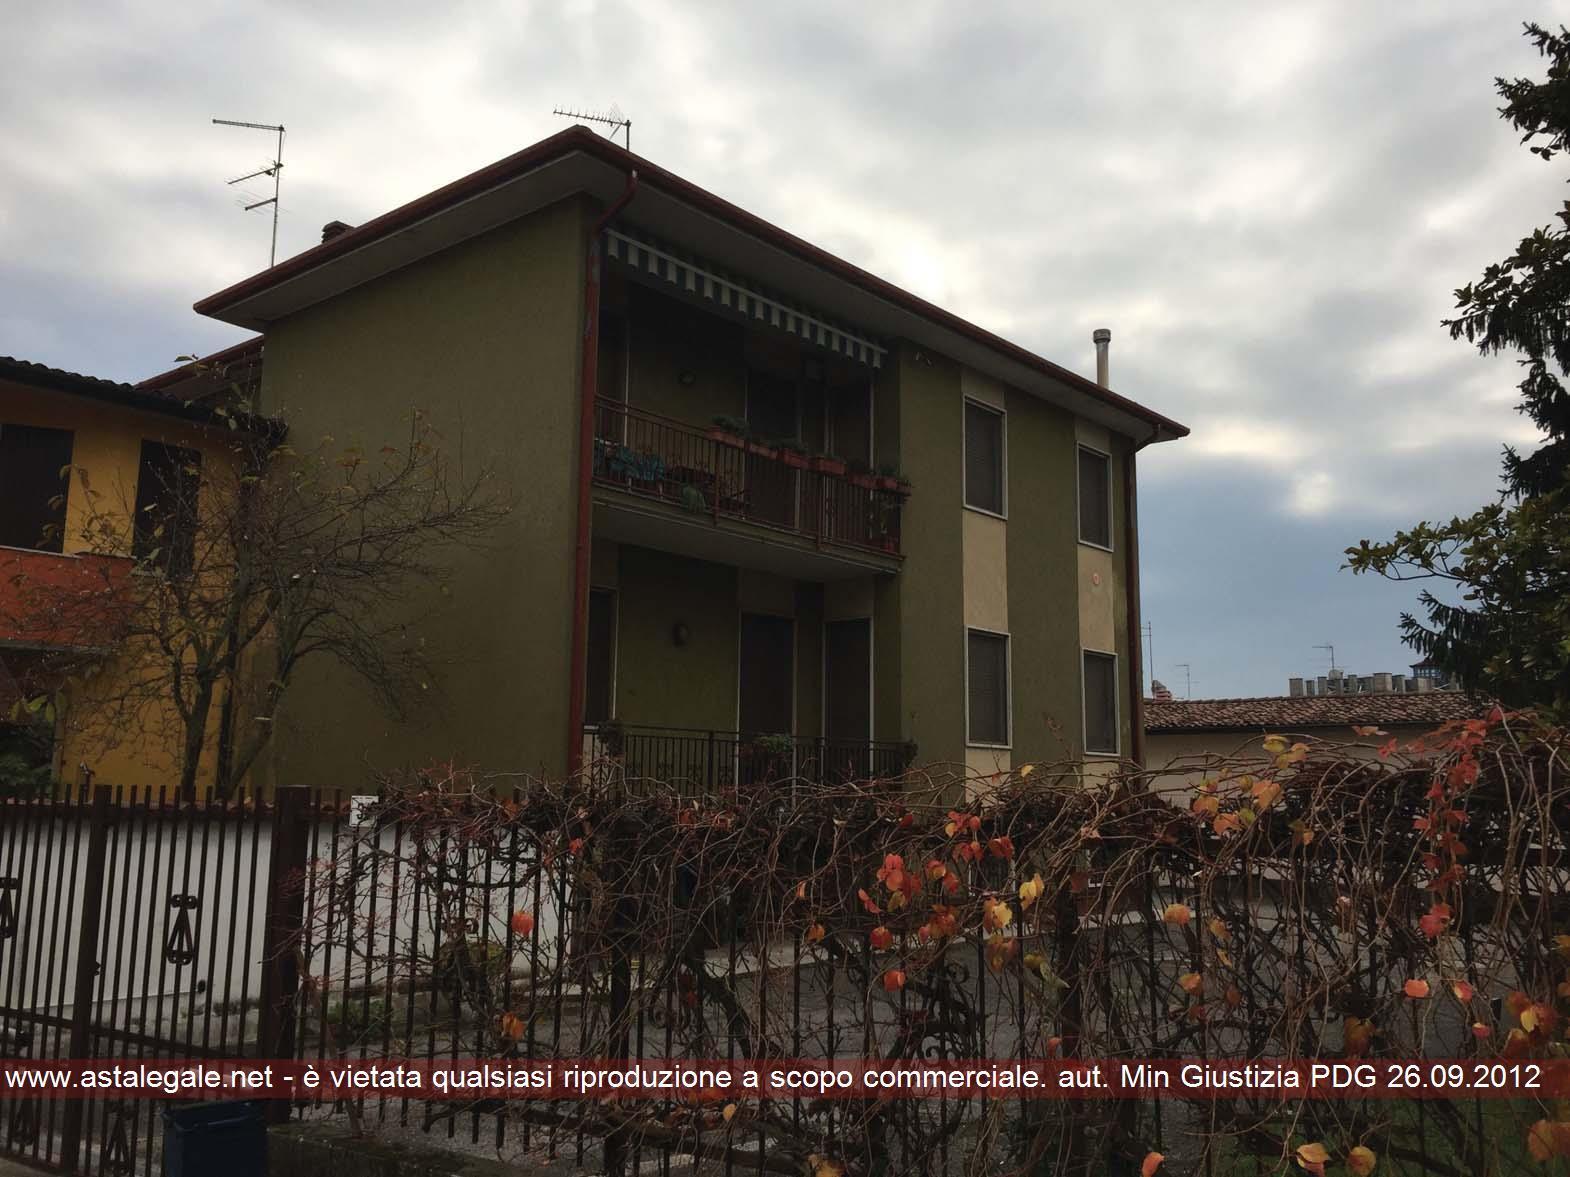 Borgo Virgilio (MN) Localita' Cappelletta - Via Val D'Ossola 29/31